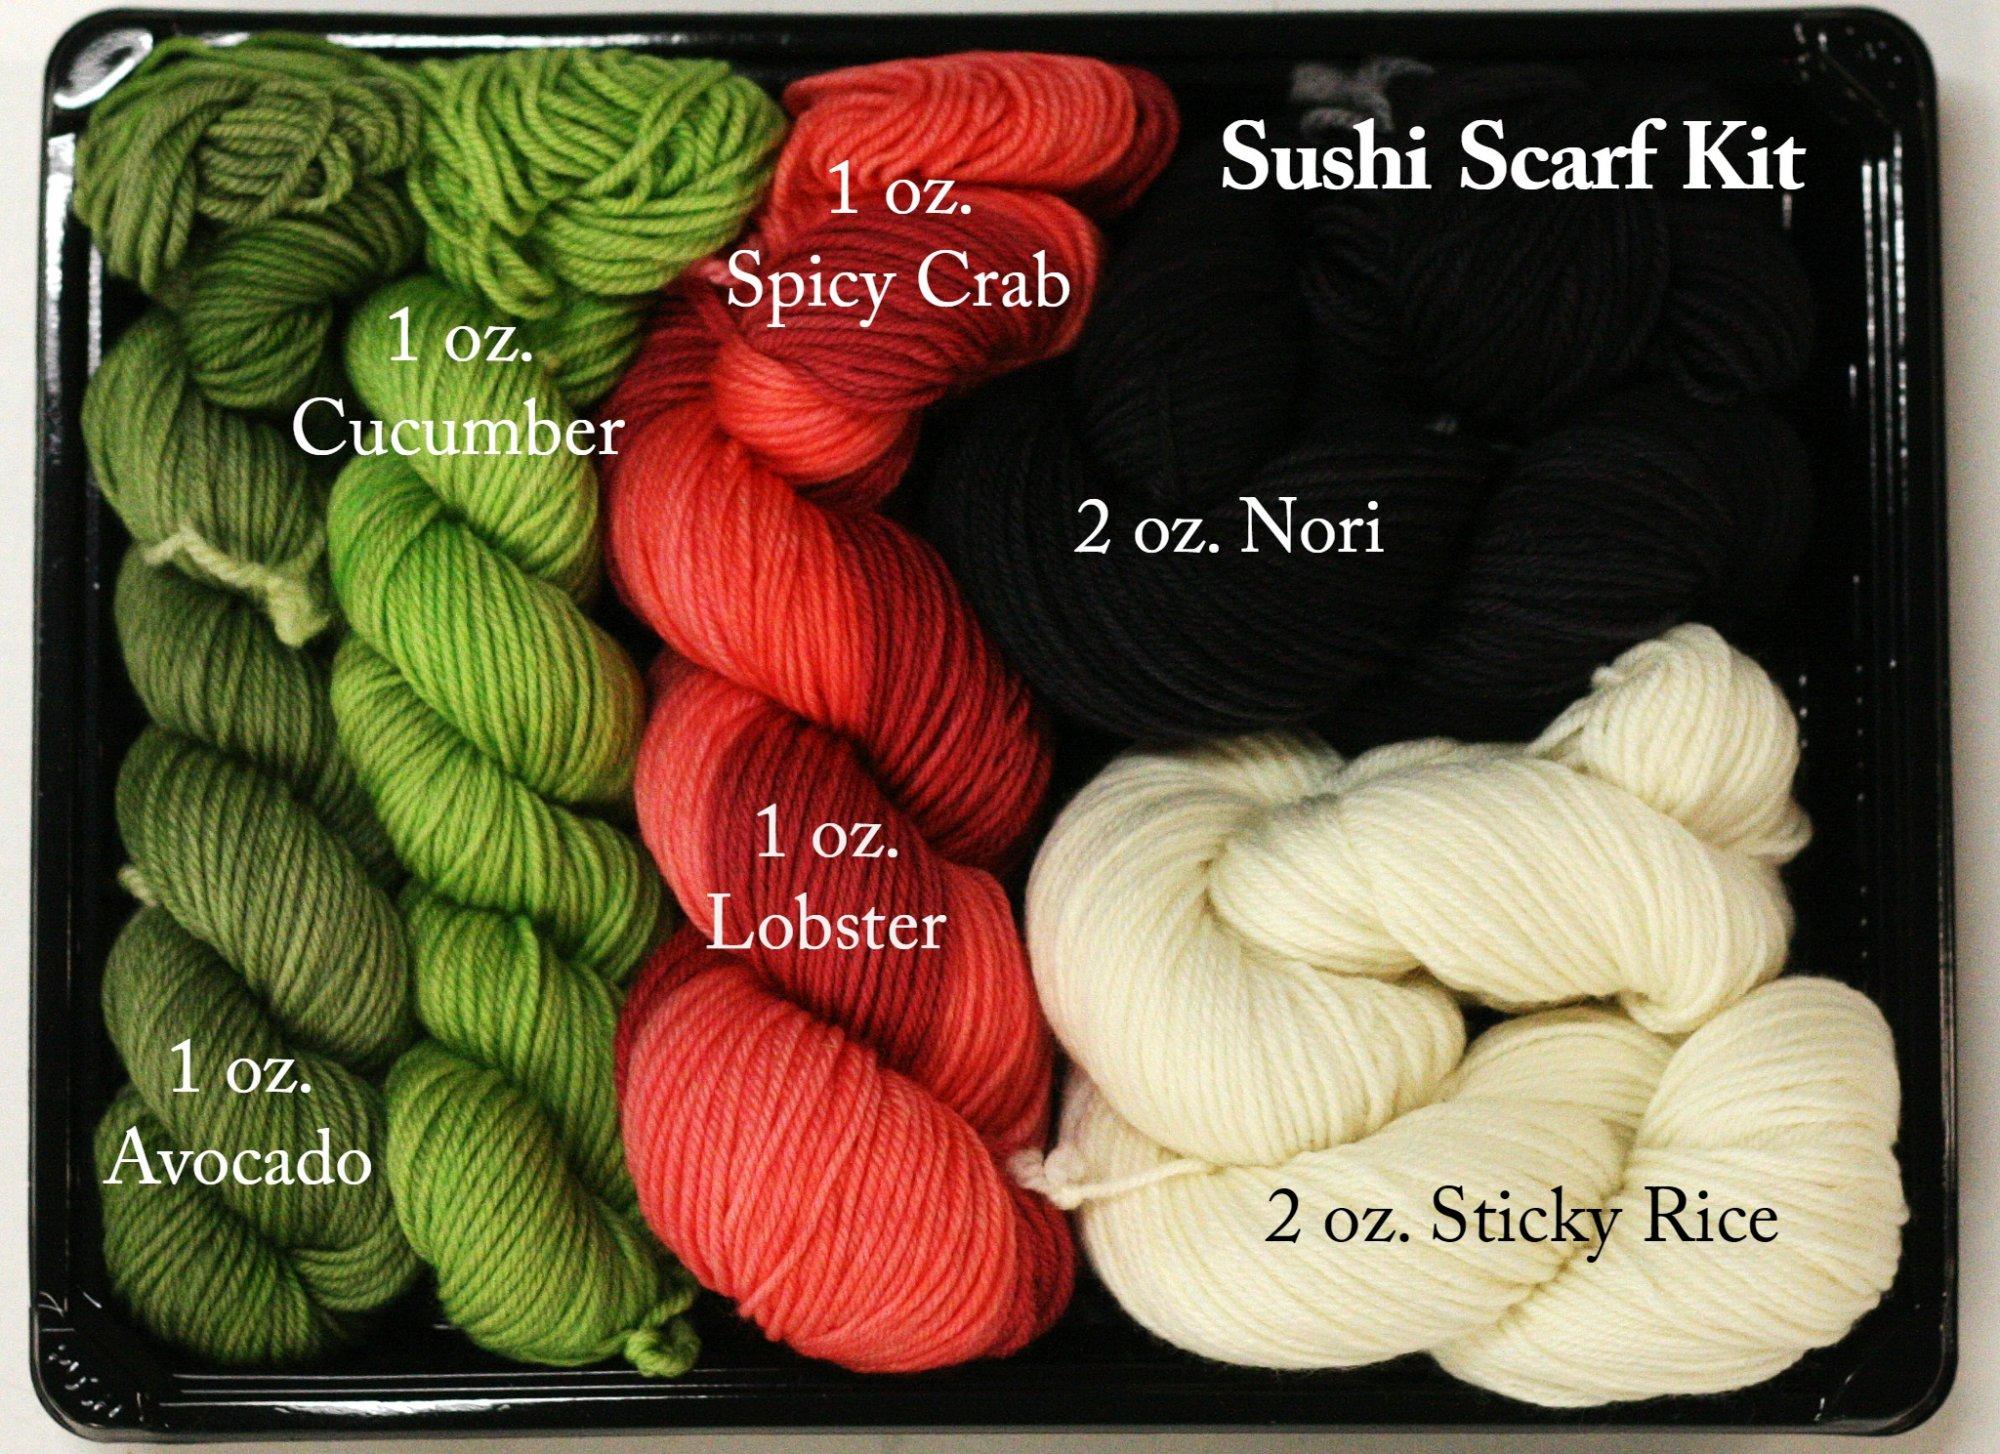 Wonderland Yarns Sushi Scarf kit